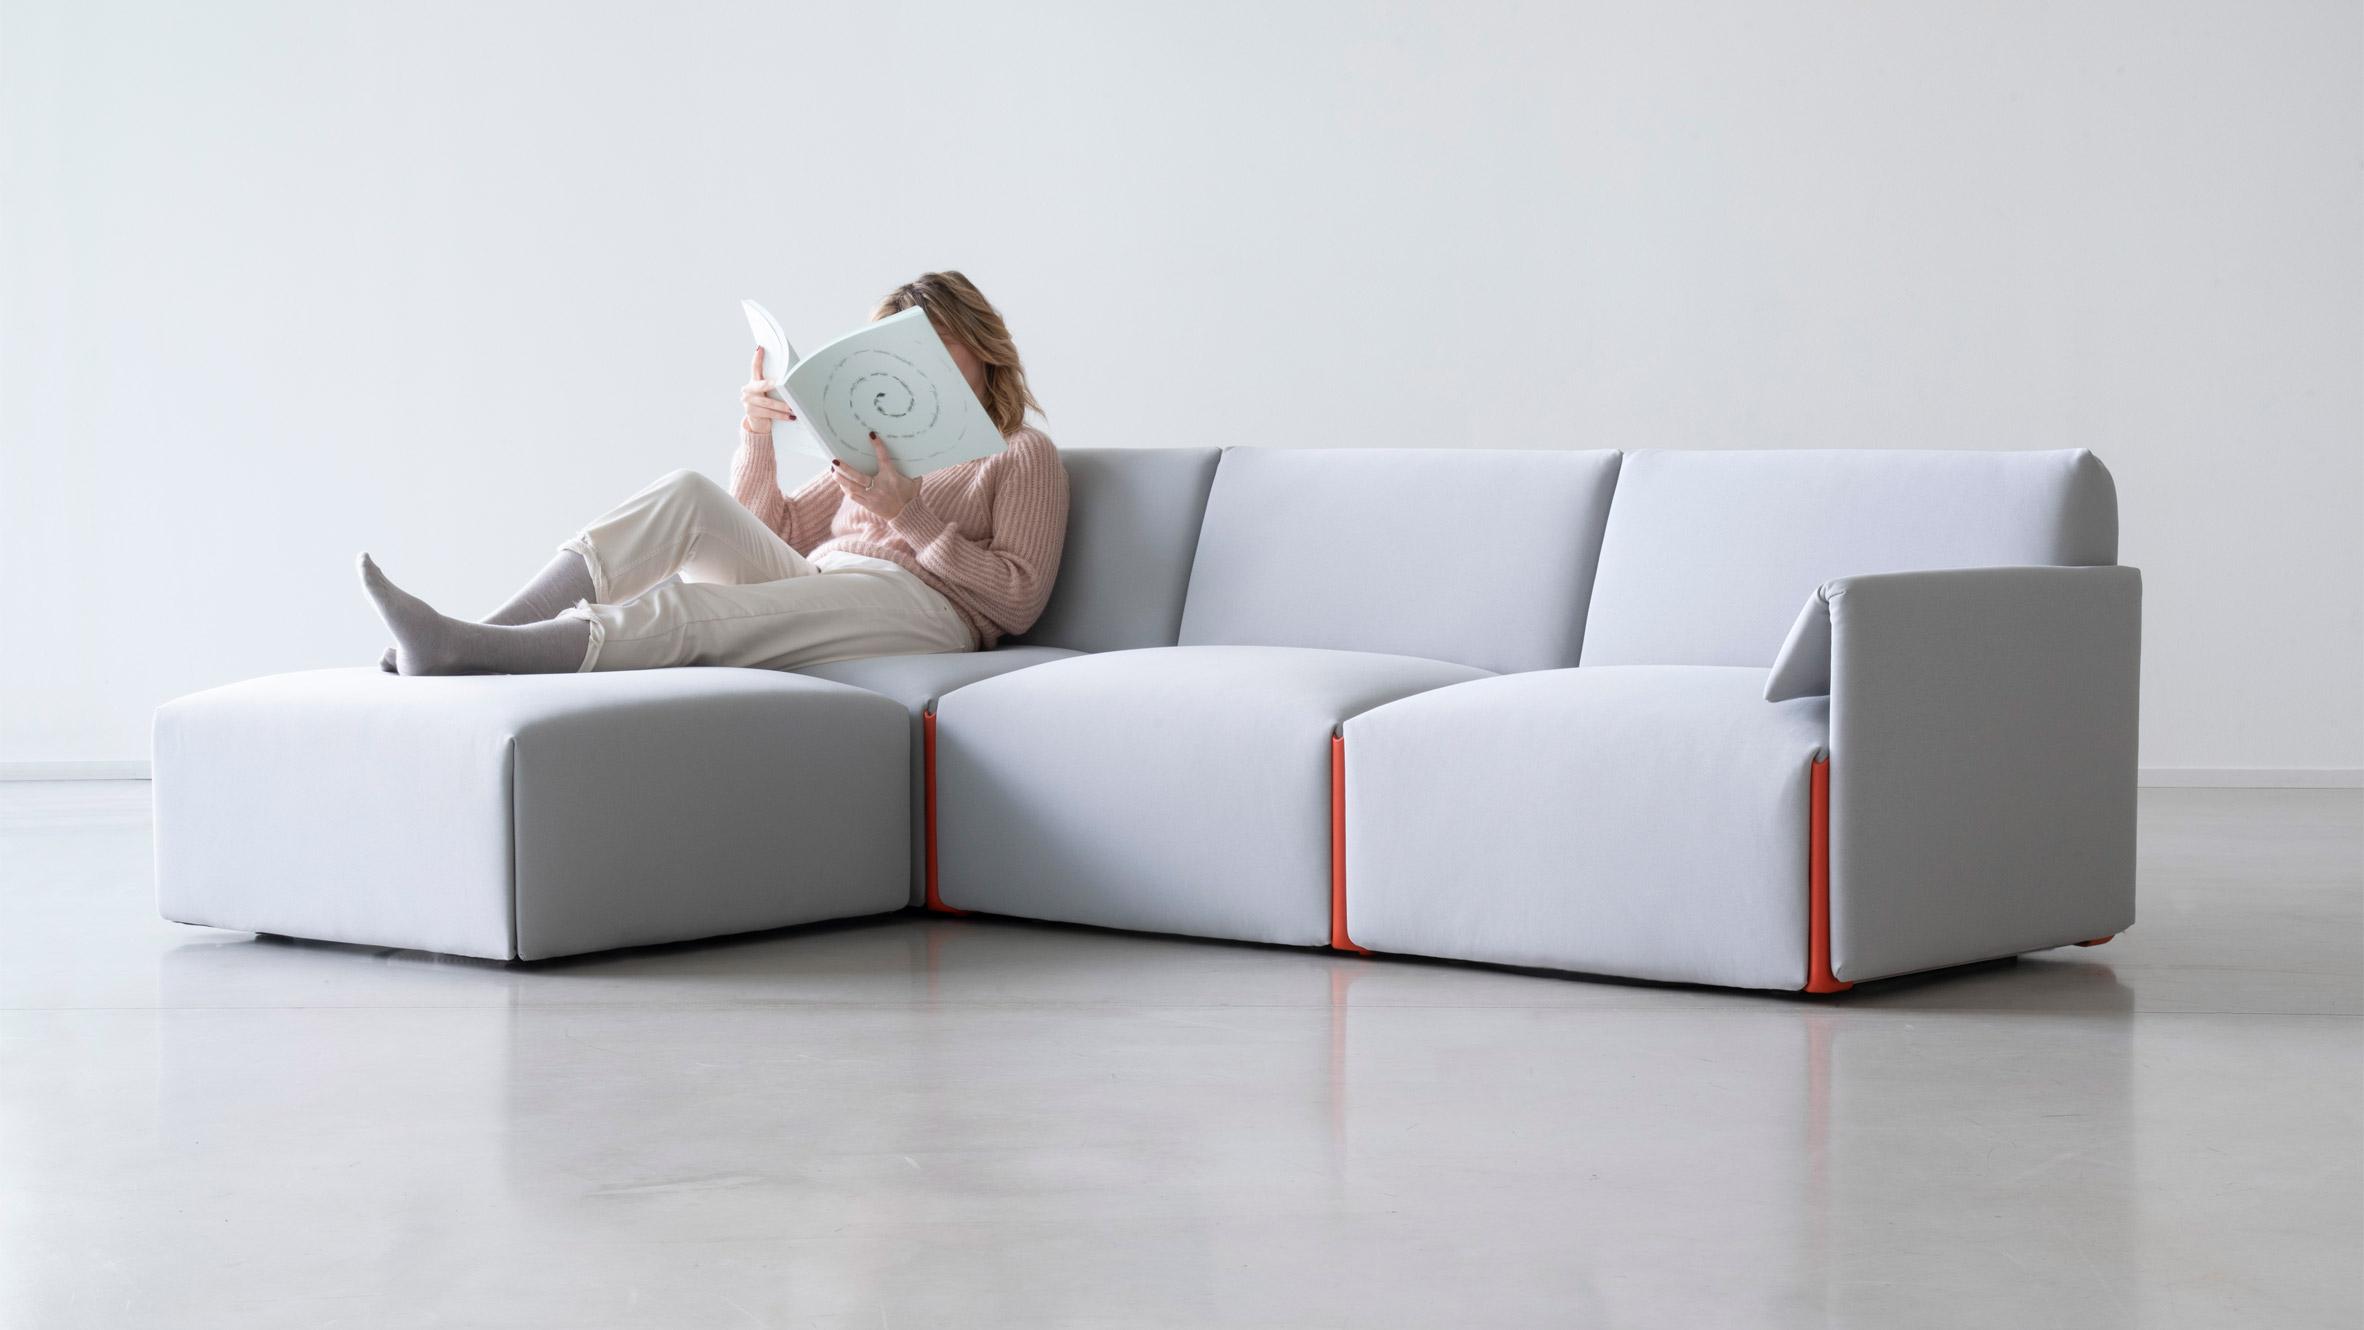 Modular sofa by Stefan Diez for Magis